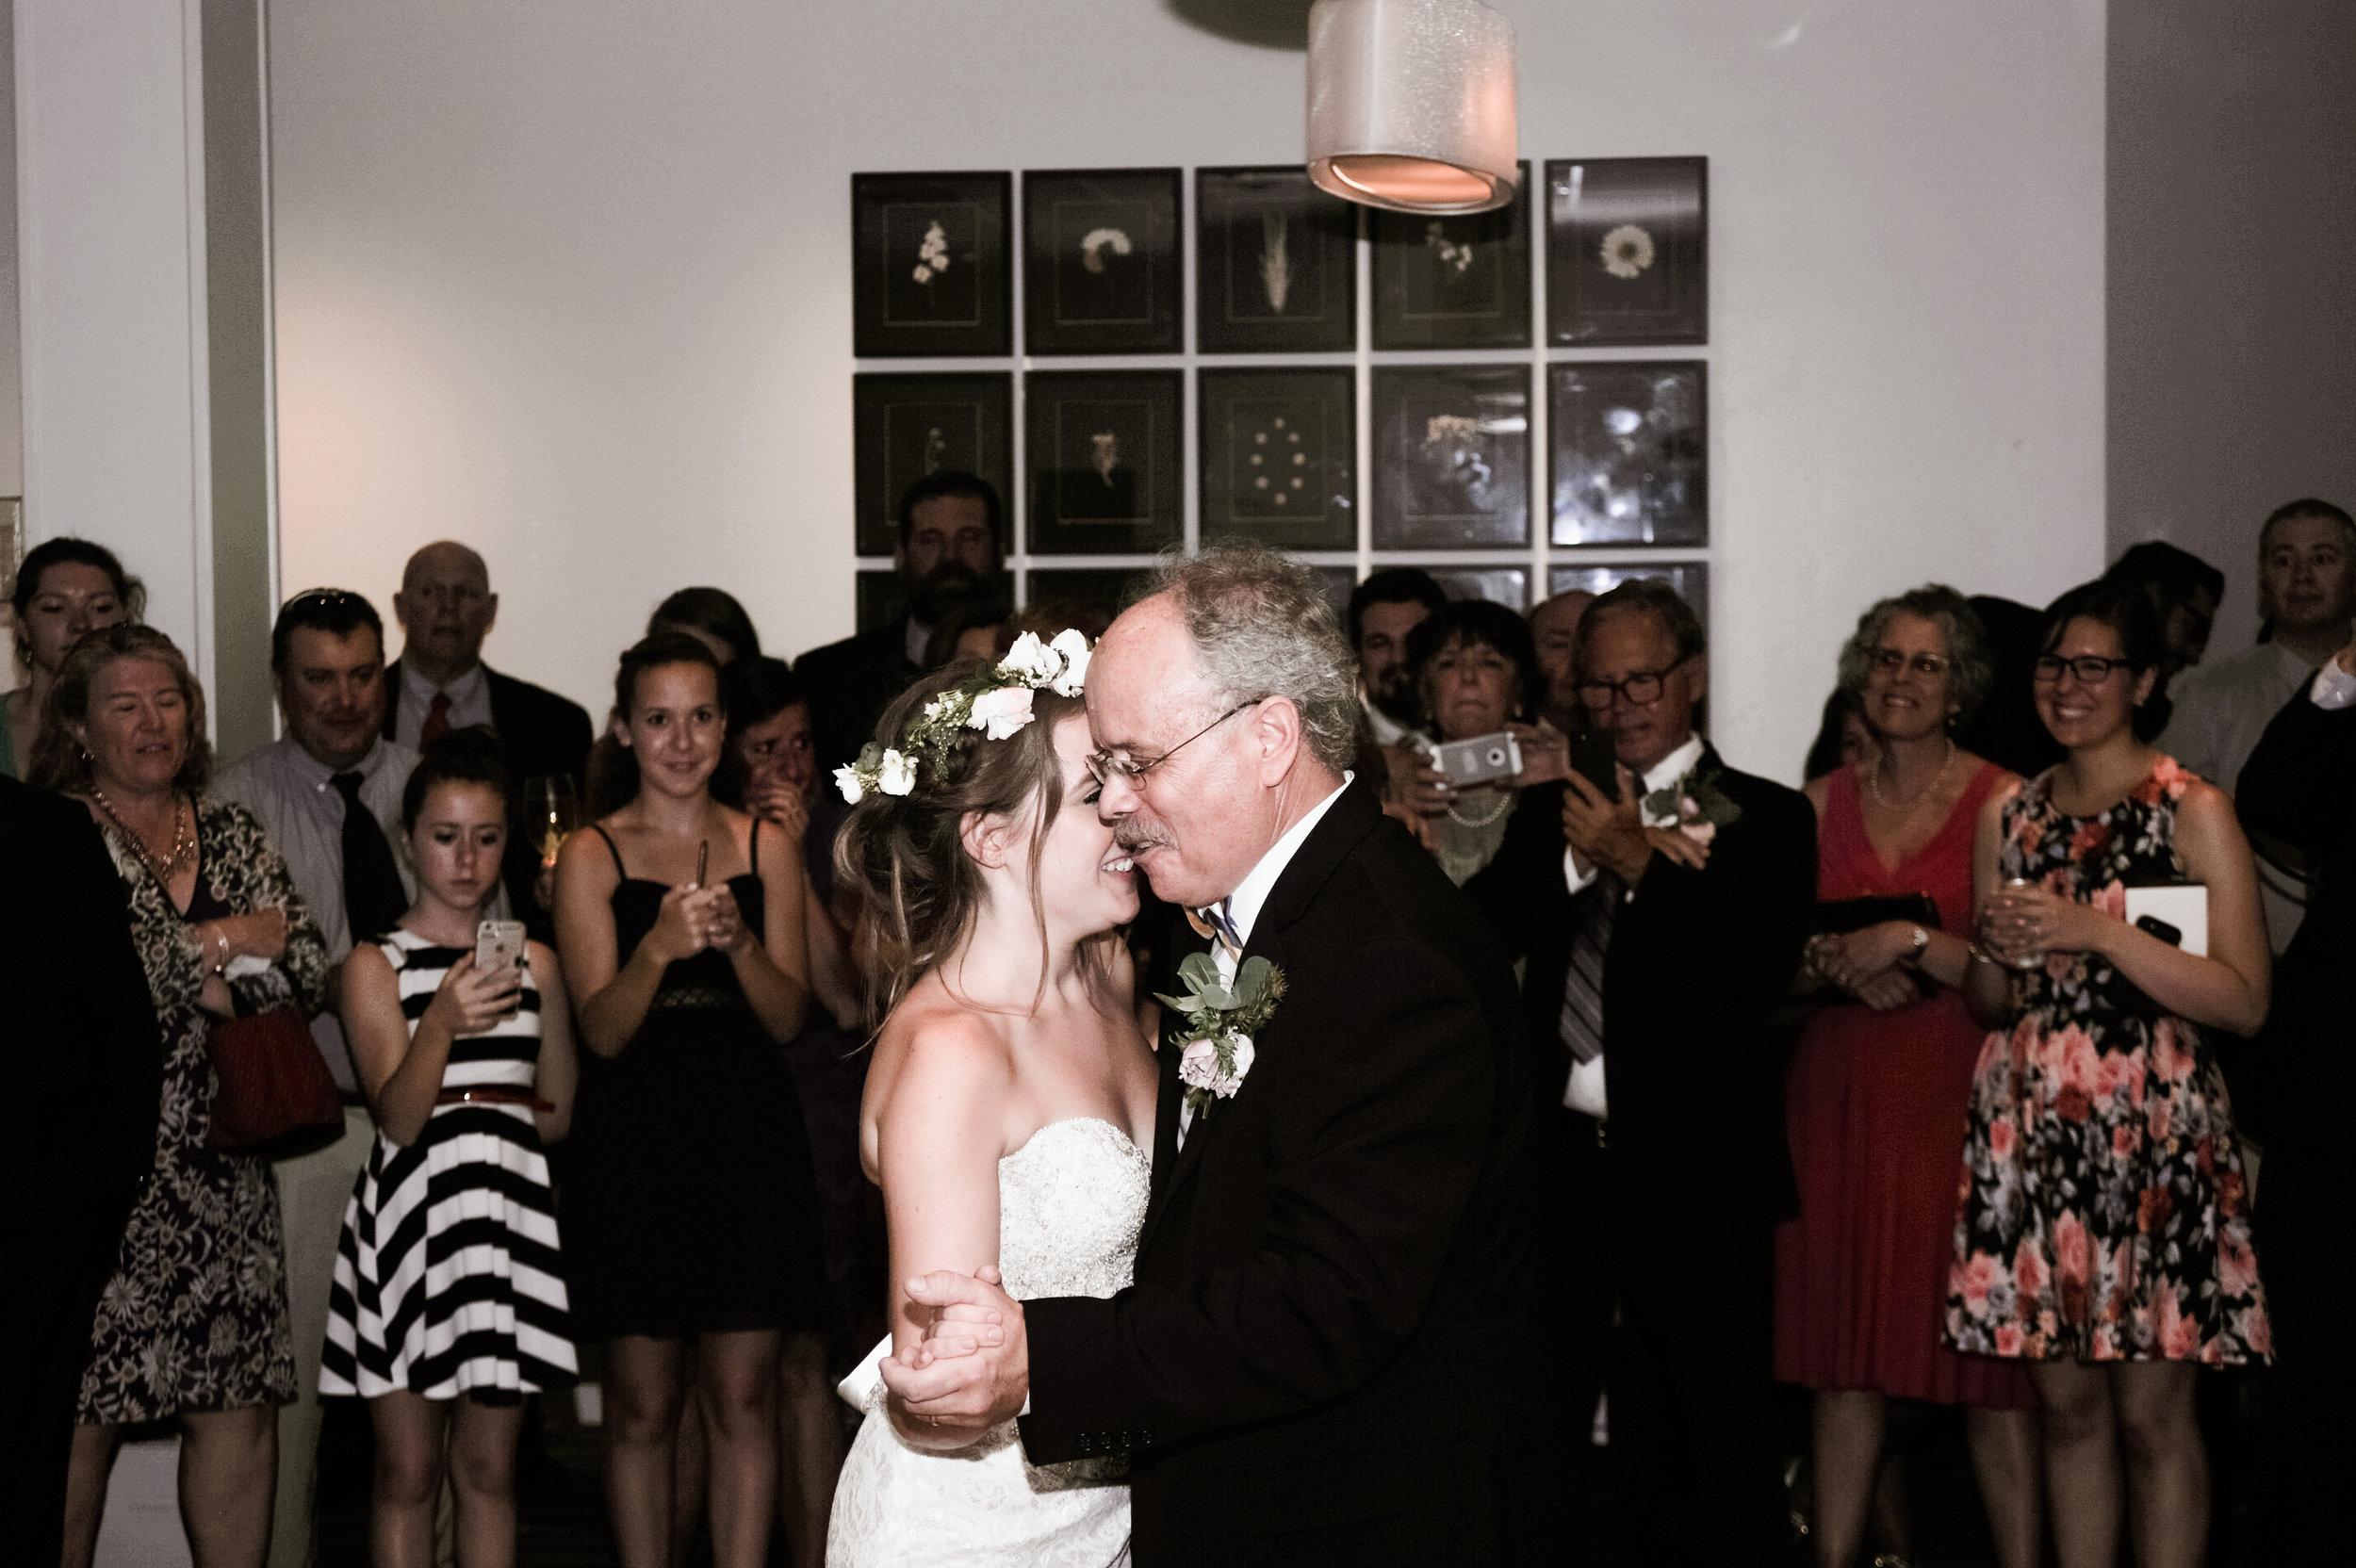 savannah-station-elopement-photographer-savannah-elopement-photography-savannah-georgia-elopement-photographer-savannah-wedding-photographer-meg-hill-photo-jade-hill- (93 of 93).jpg